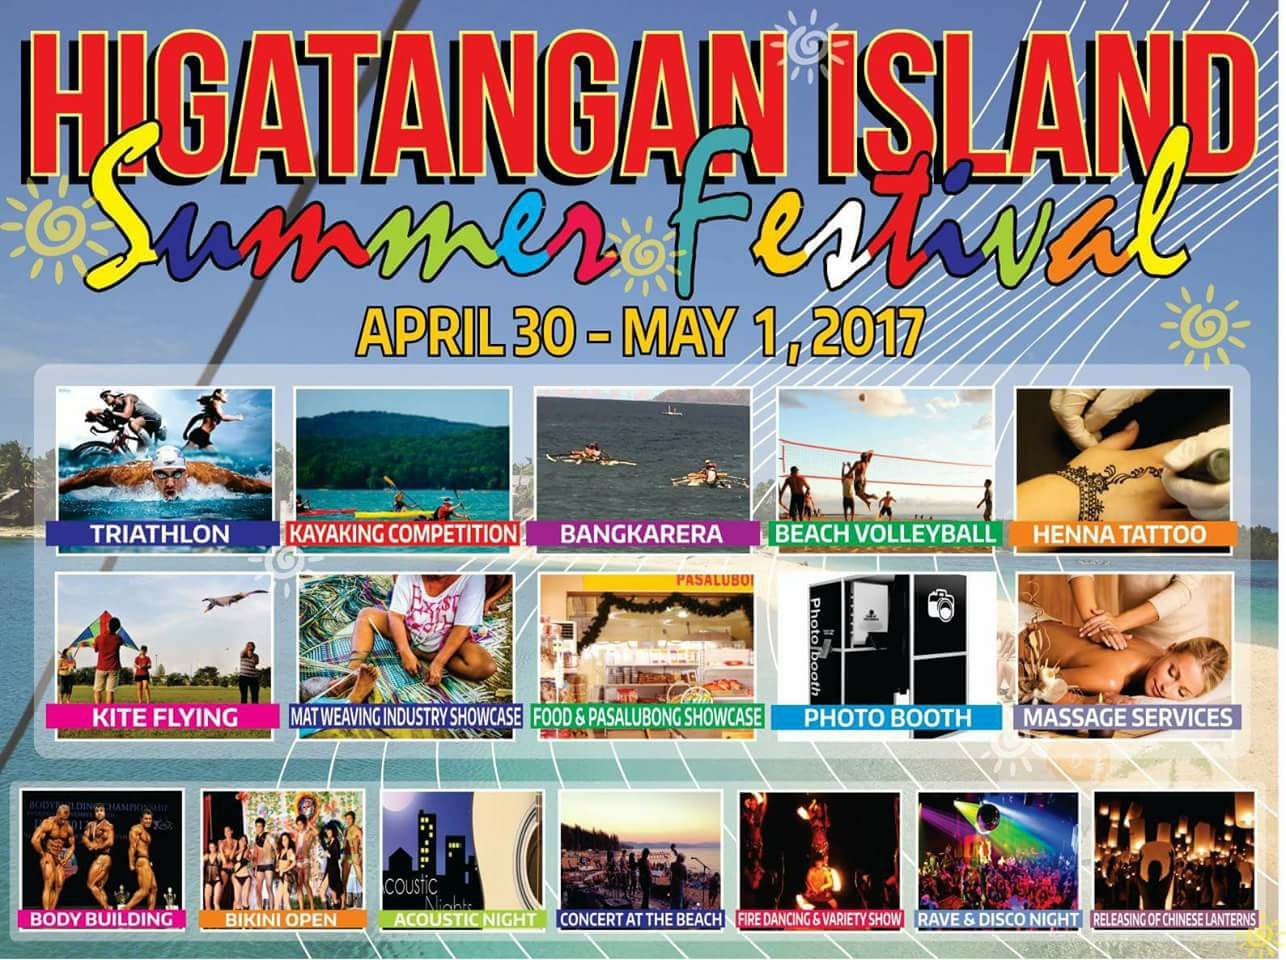 Higatagan Island Summer Festival